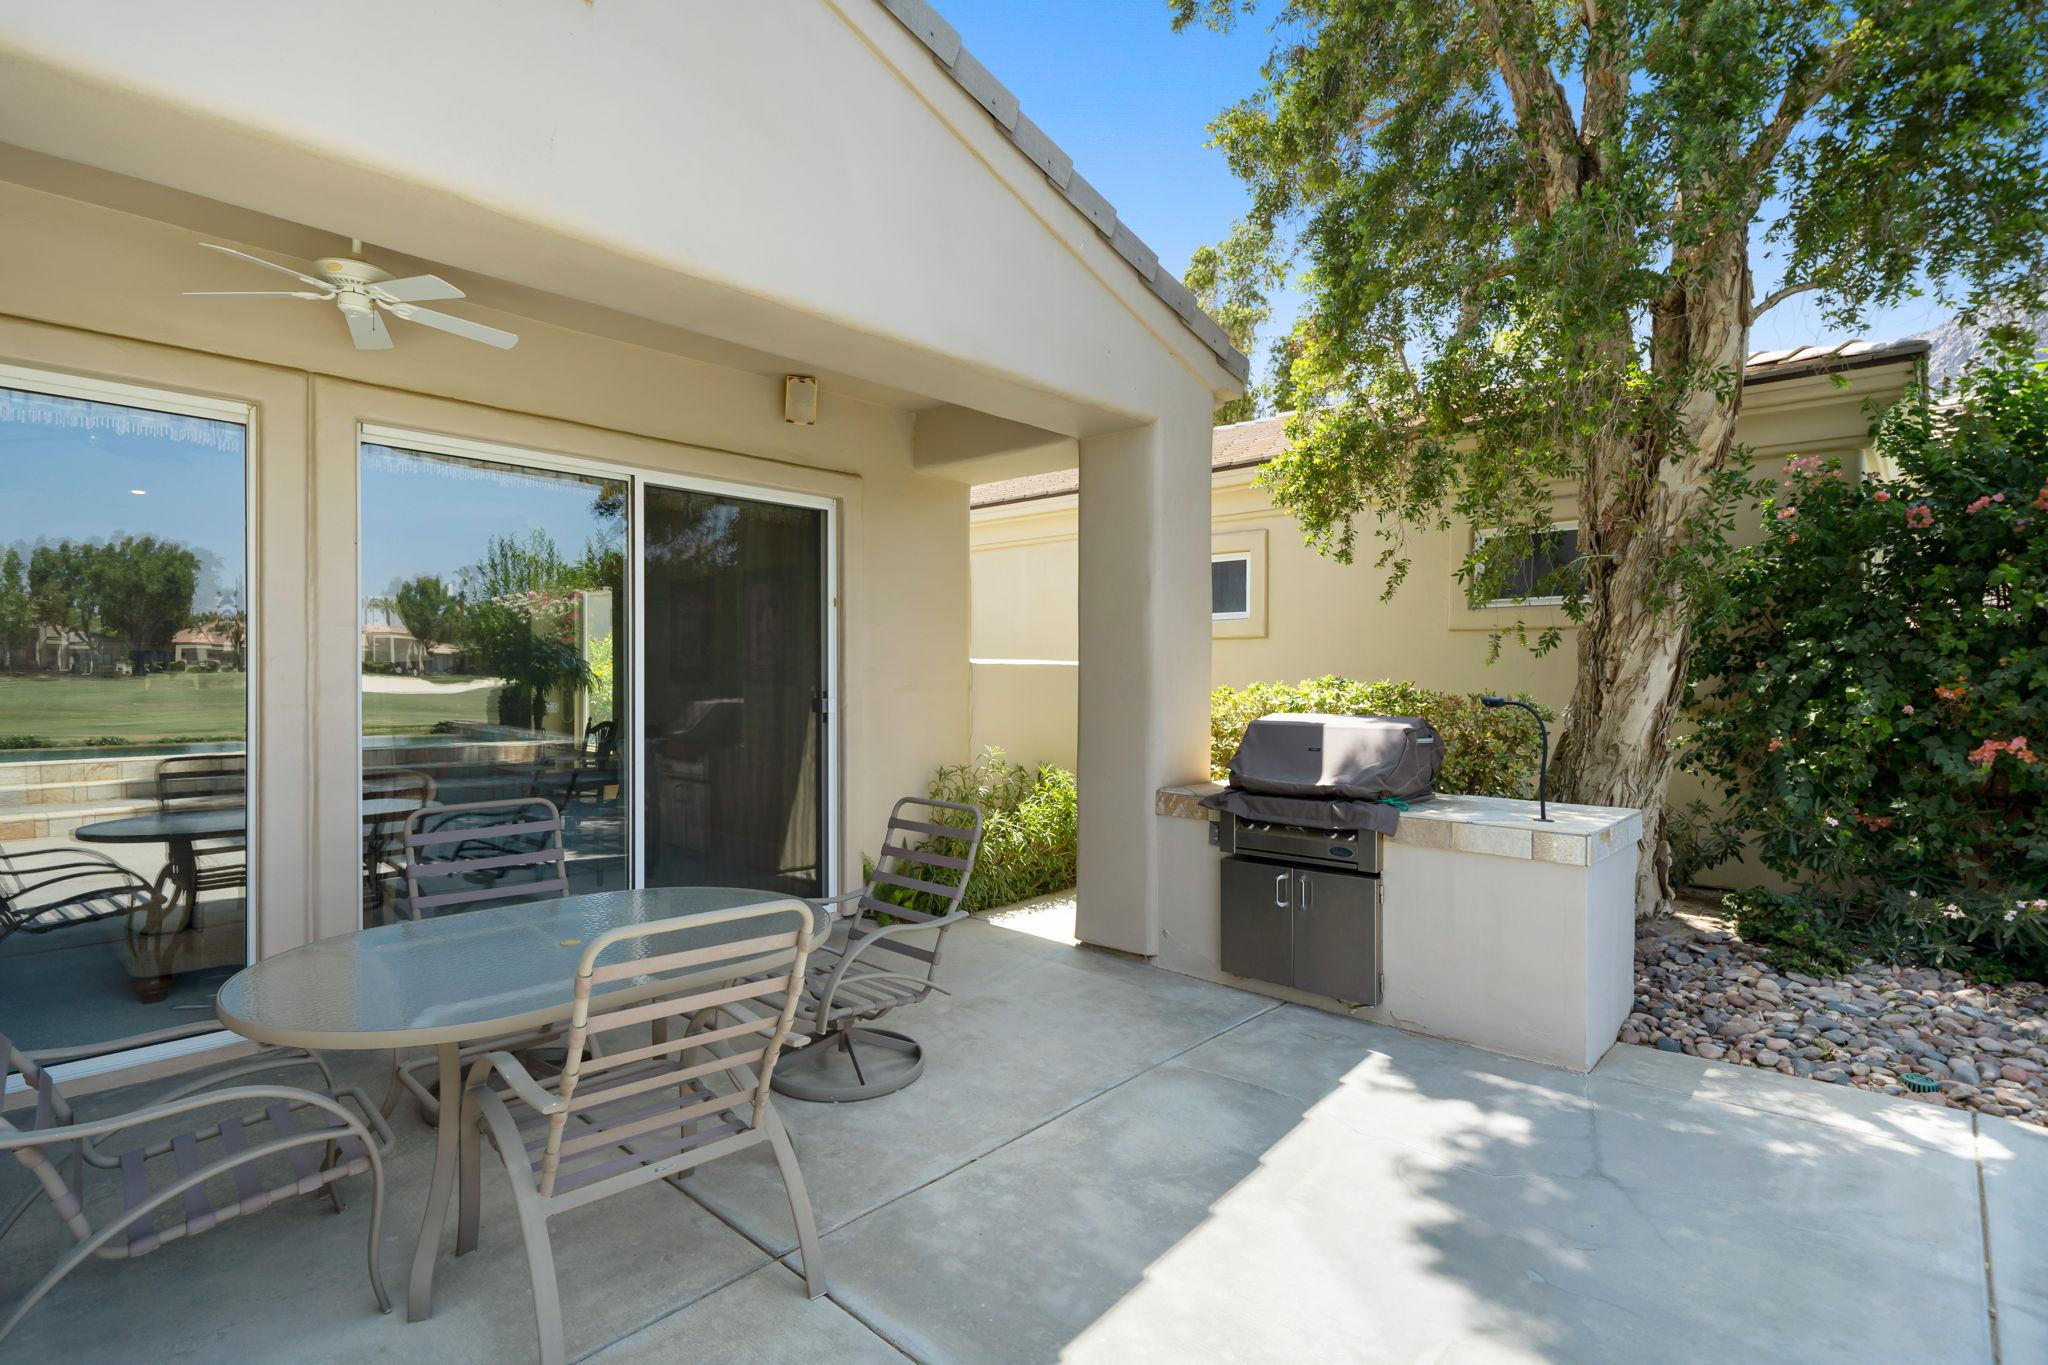 54562 Tanglewood, La Quinta, CA 92253, USA Photo 29